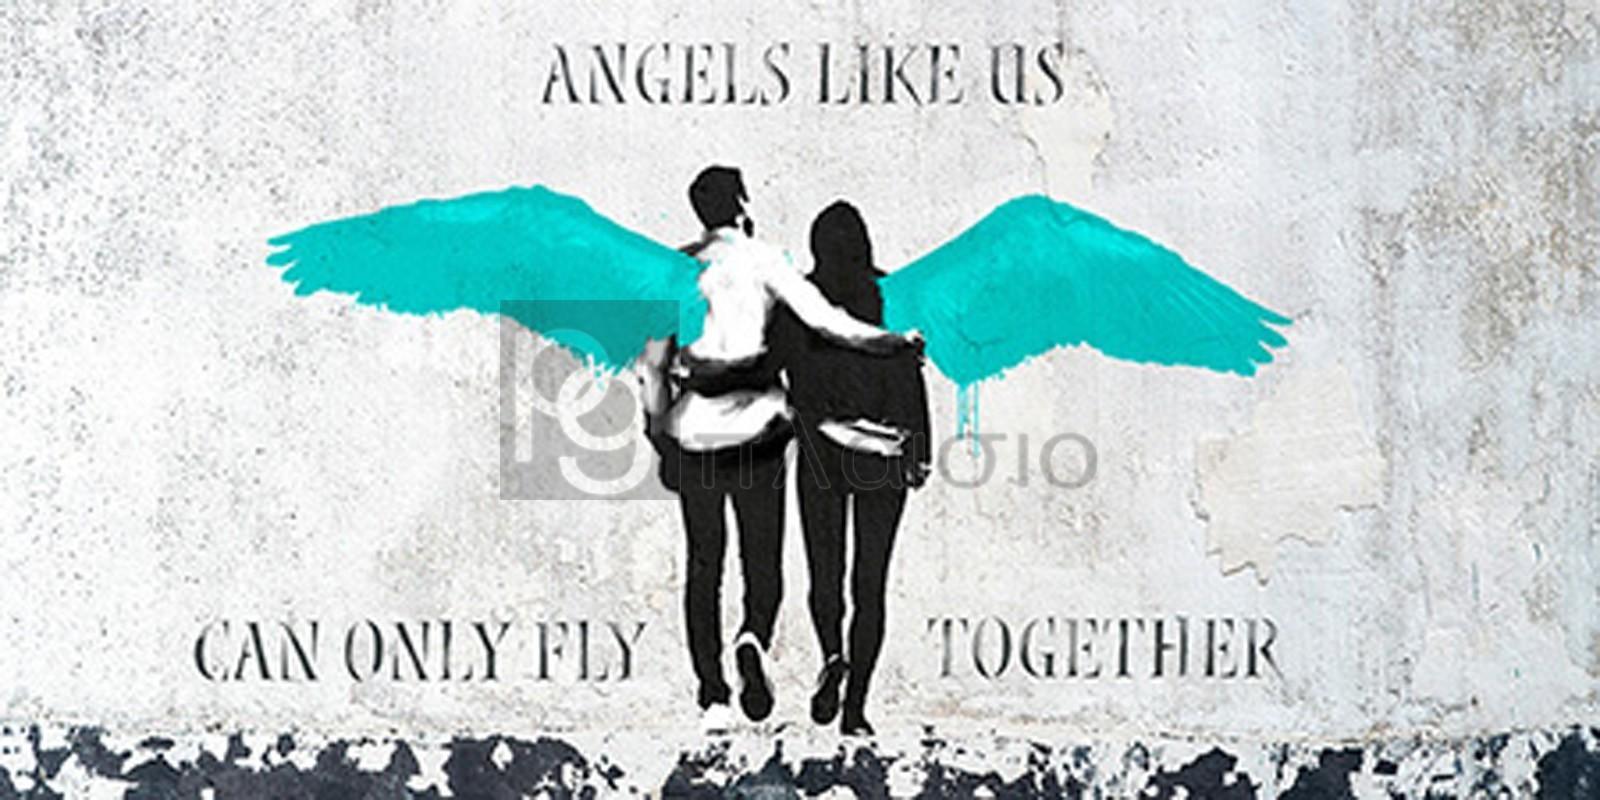 MASTERFUNK COLLECTIVE - Angels Like Us (Aqua)